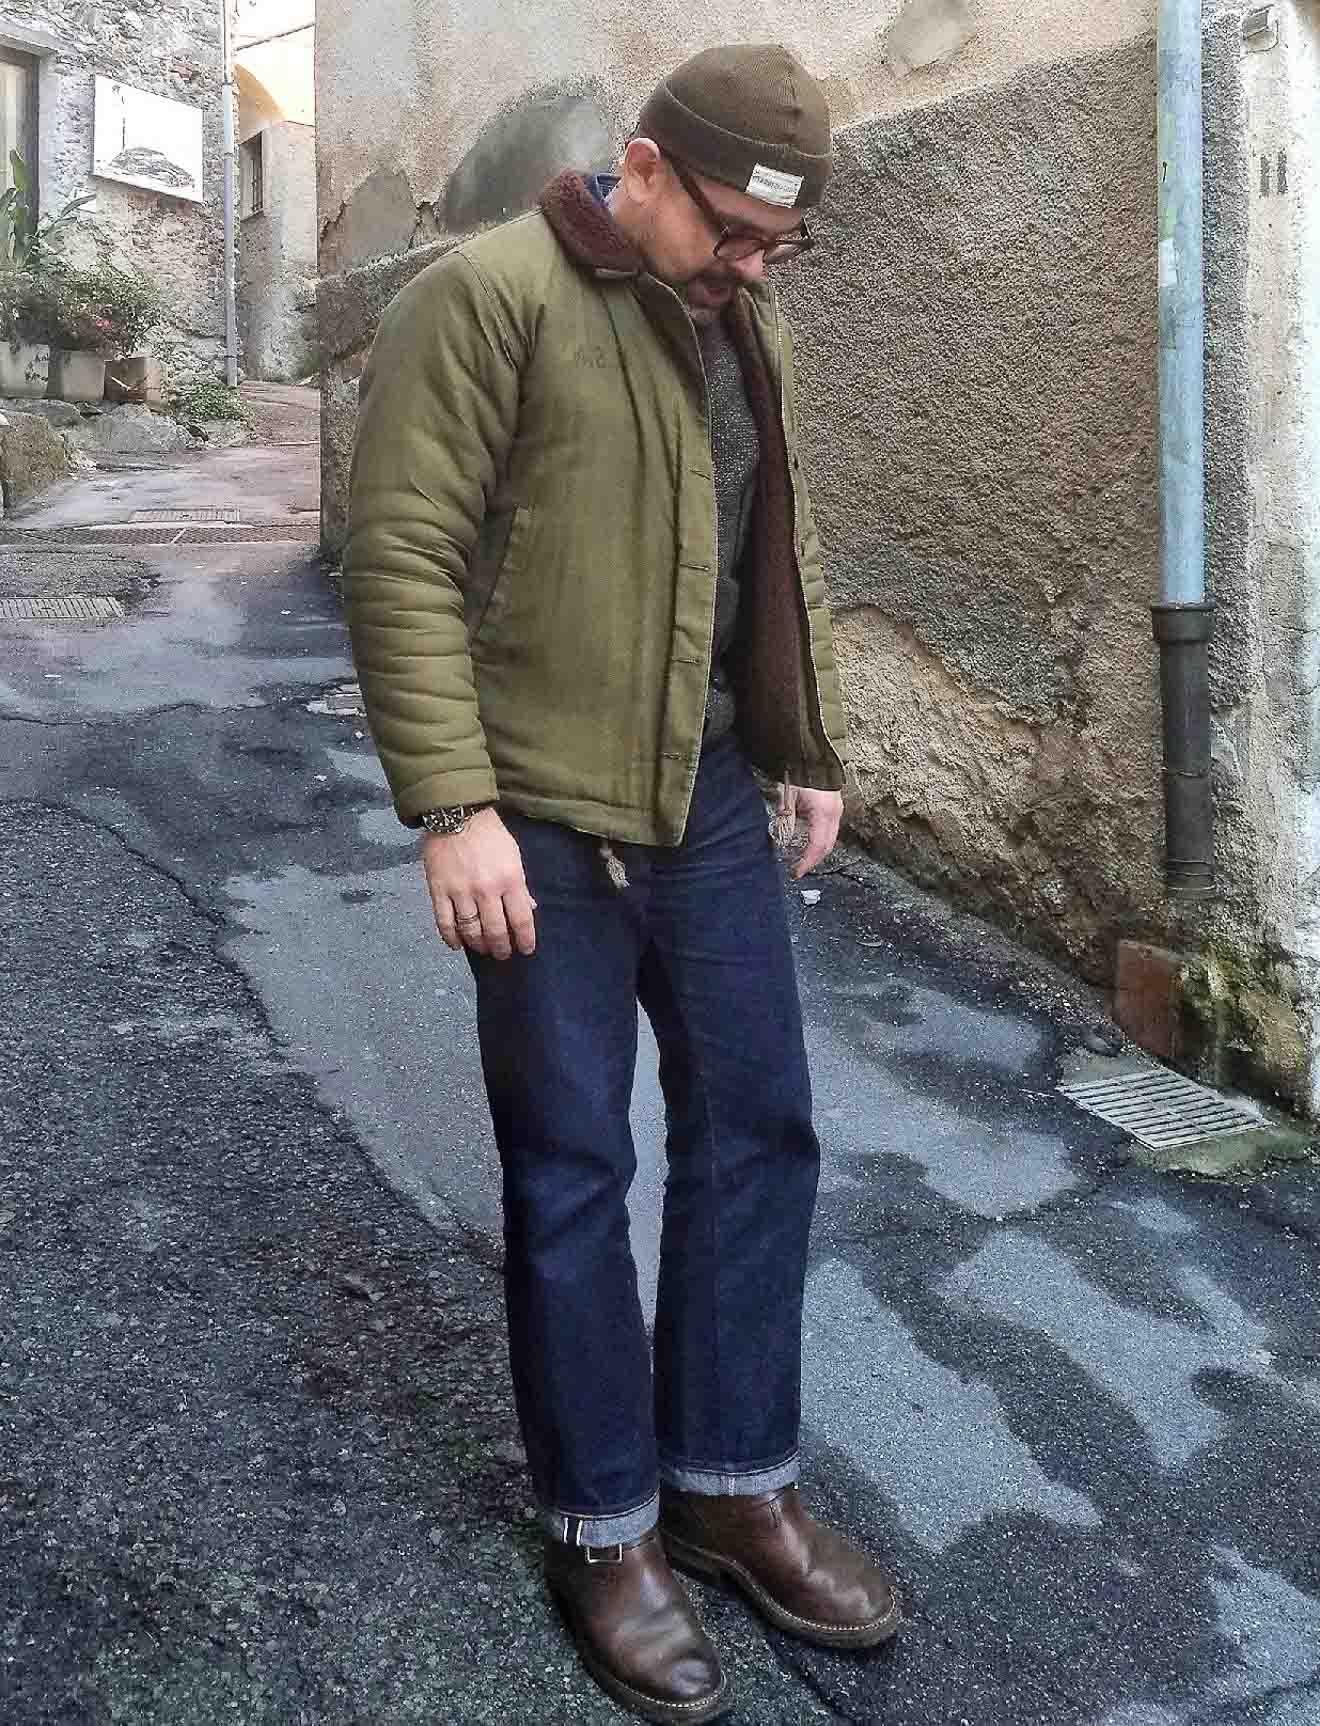 Blue Blooded, Instagrammer, volvosufu, Denimhunters, TCB Jeans, 60s, raw denim, Japanese denim, selvedge denim, N1 deck jacket